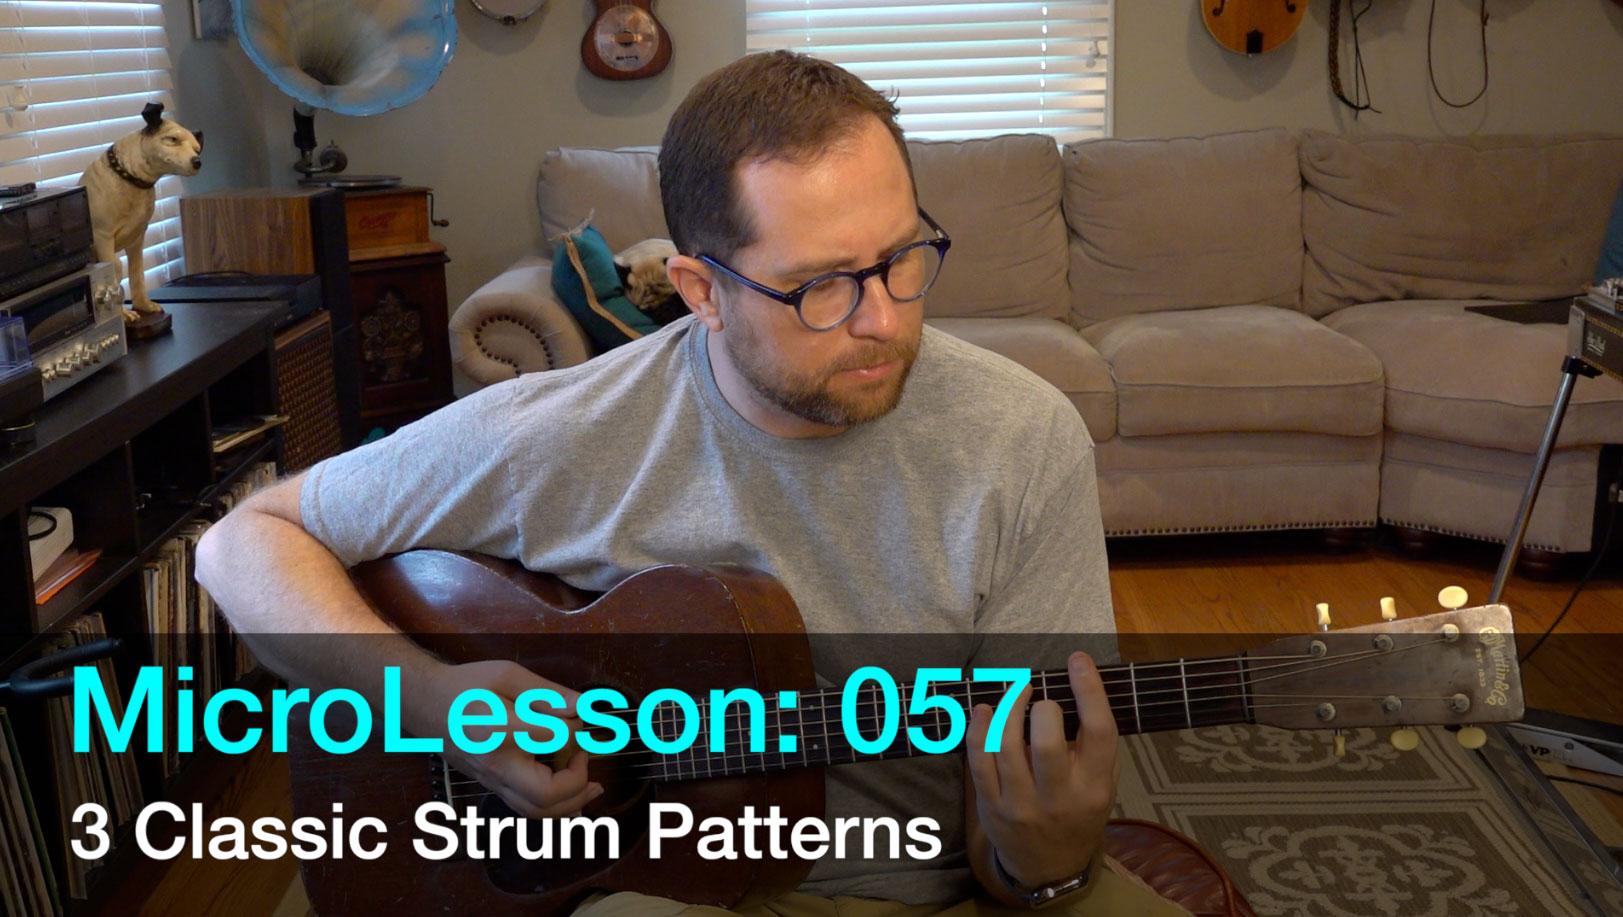 MicroLesson: 057 – Learn 3 Classic Rhythm Styles on Guitar (Blues, Bluegrass, and Folk)